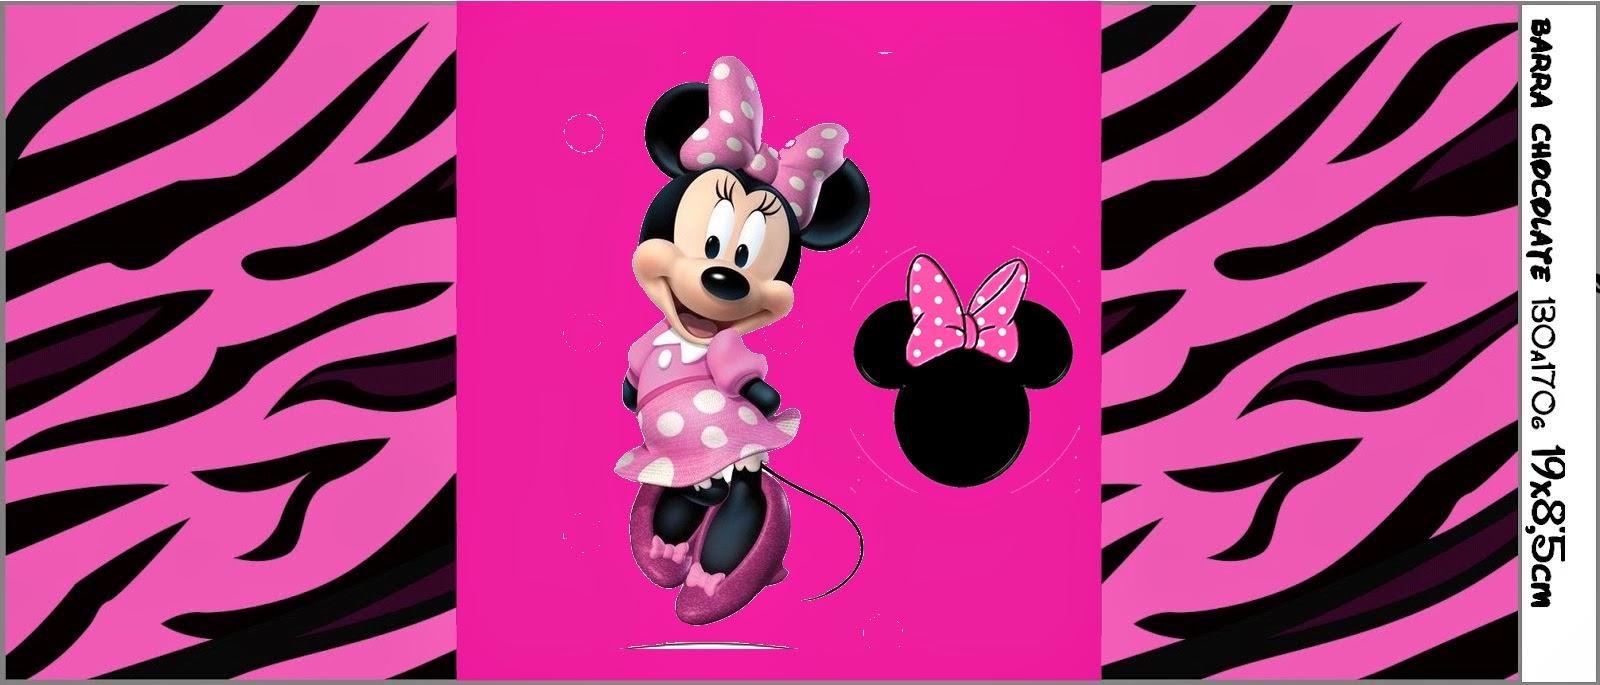 Etiquetas para Imprimir Gratis de Minnie Cebra Rosa.